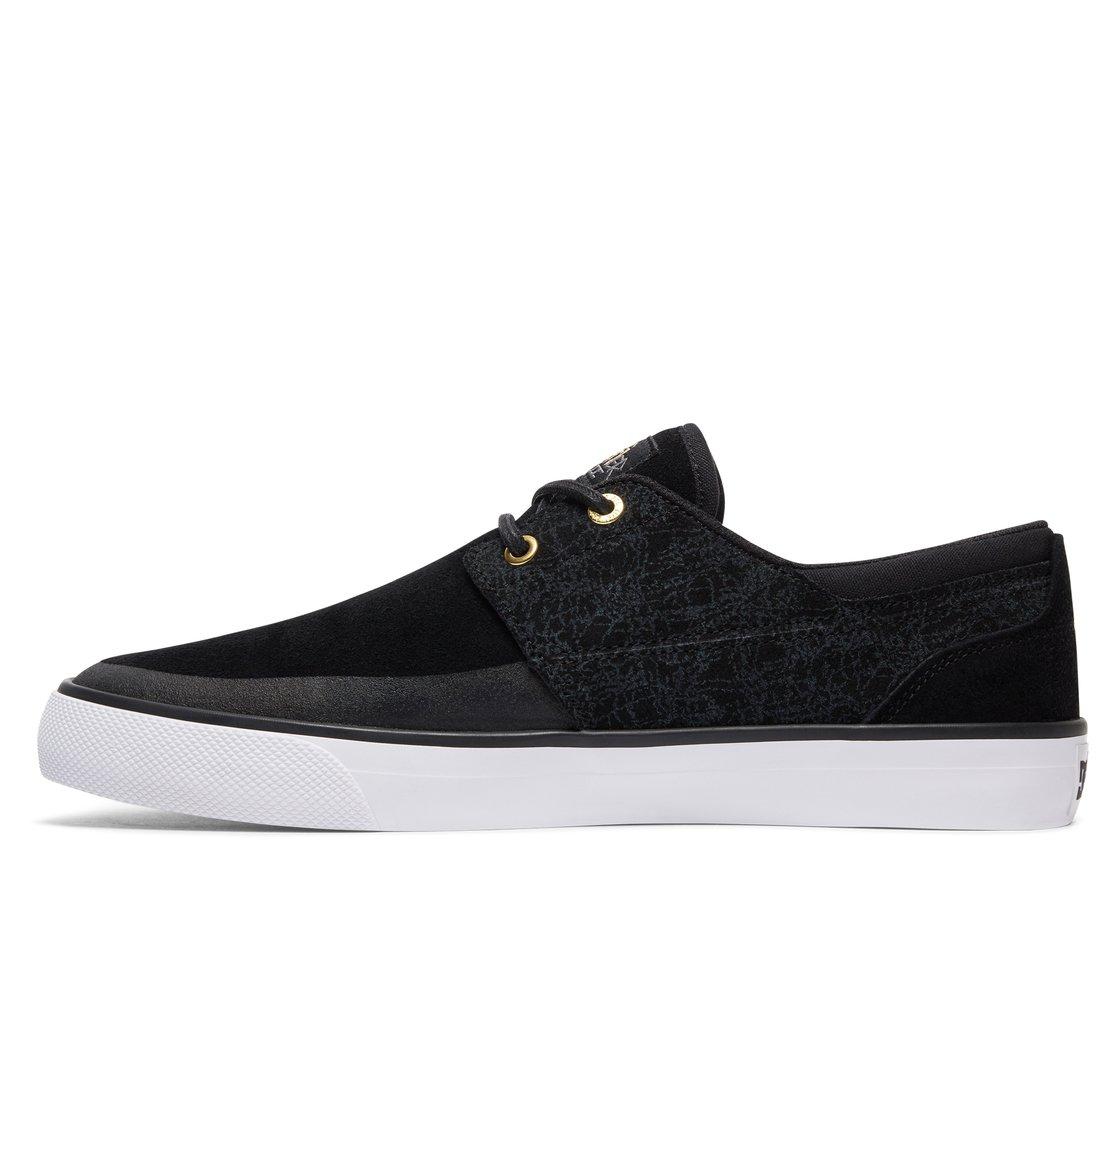 DC Shoes Wes Kremer 2 X Sk8Mafia - Shoes - Zapatos - Hombre - EU 46 tpaLyF